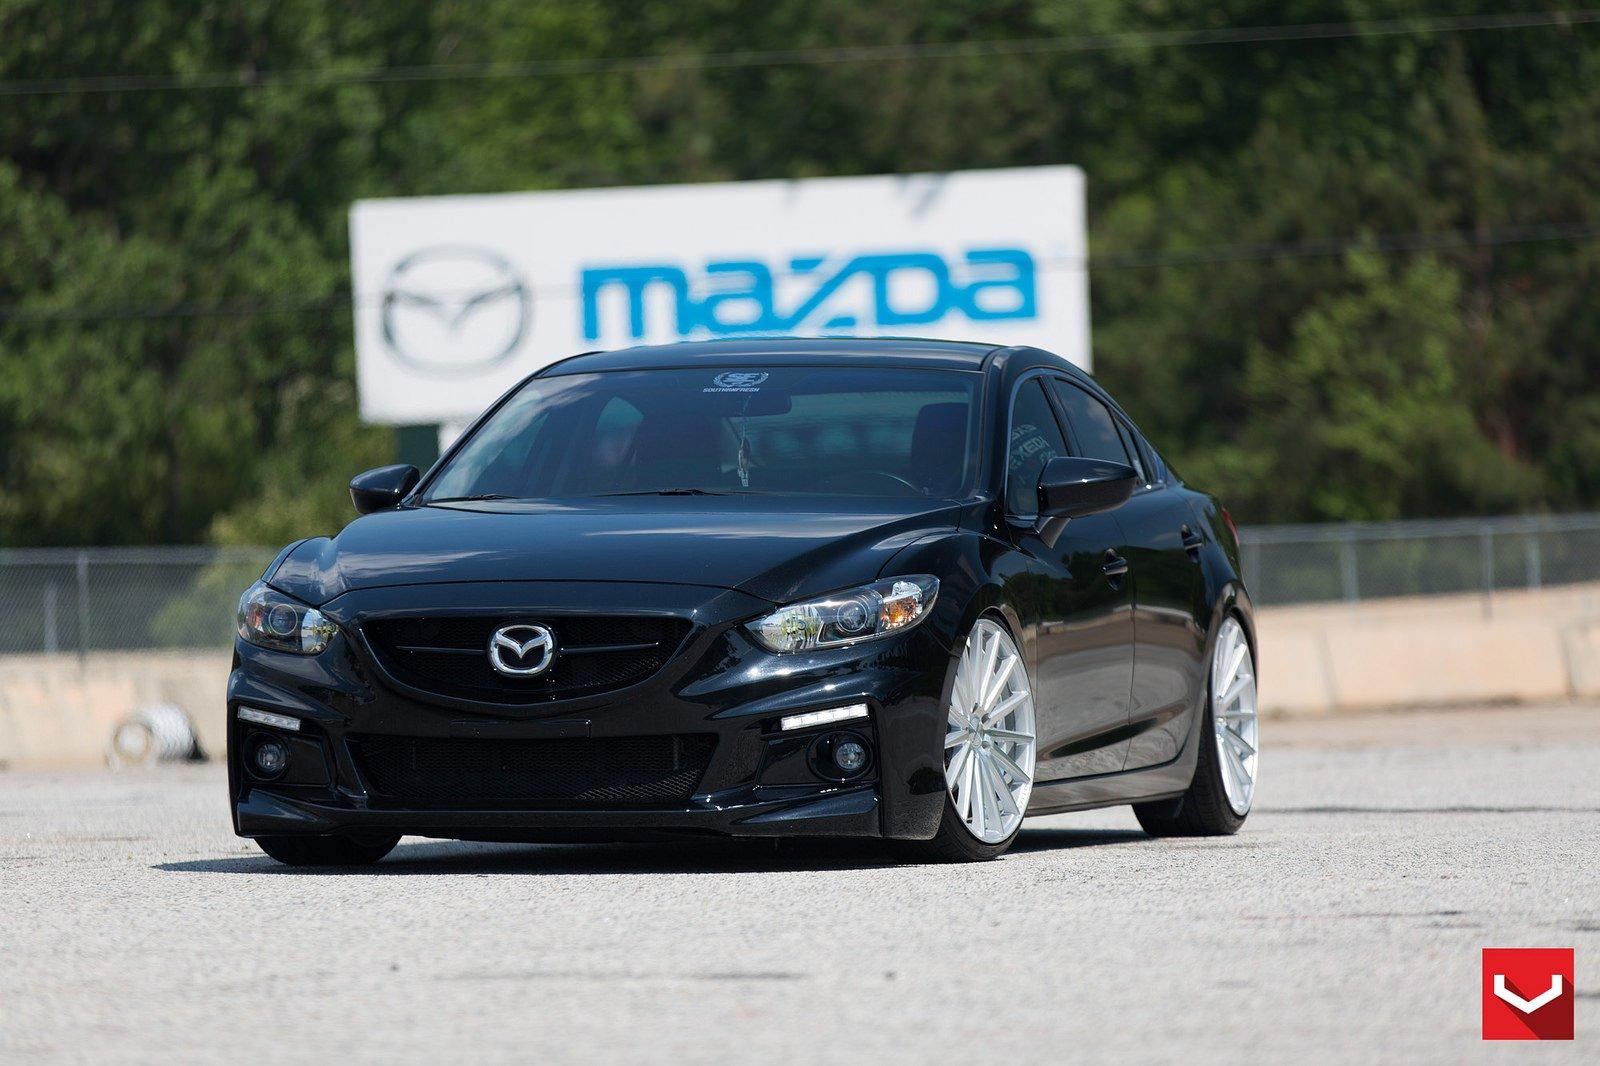 Vossen Wheels Cars Tuning Mazda 6 Black Wallpaper